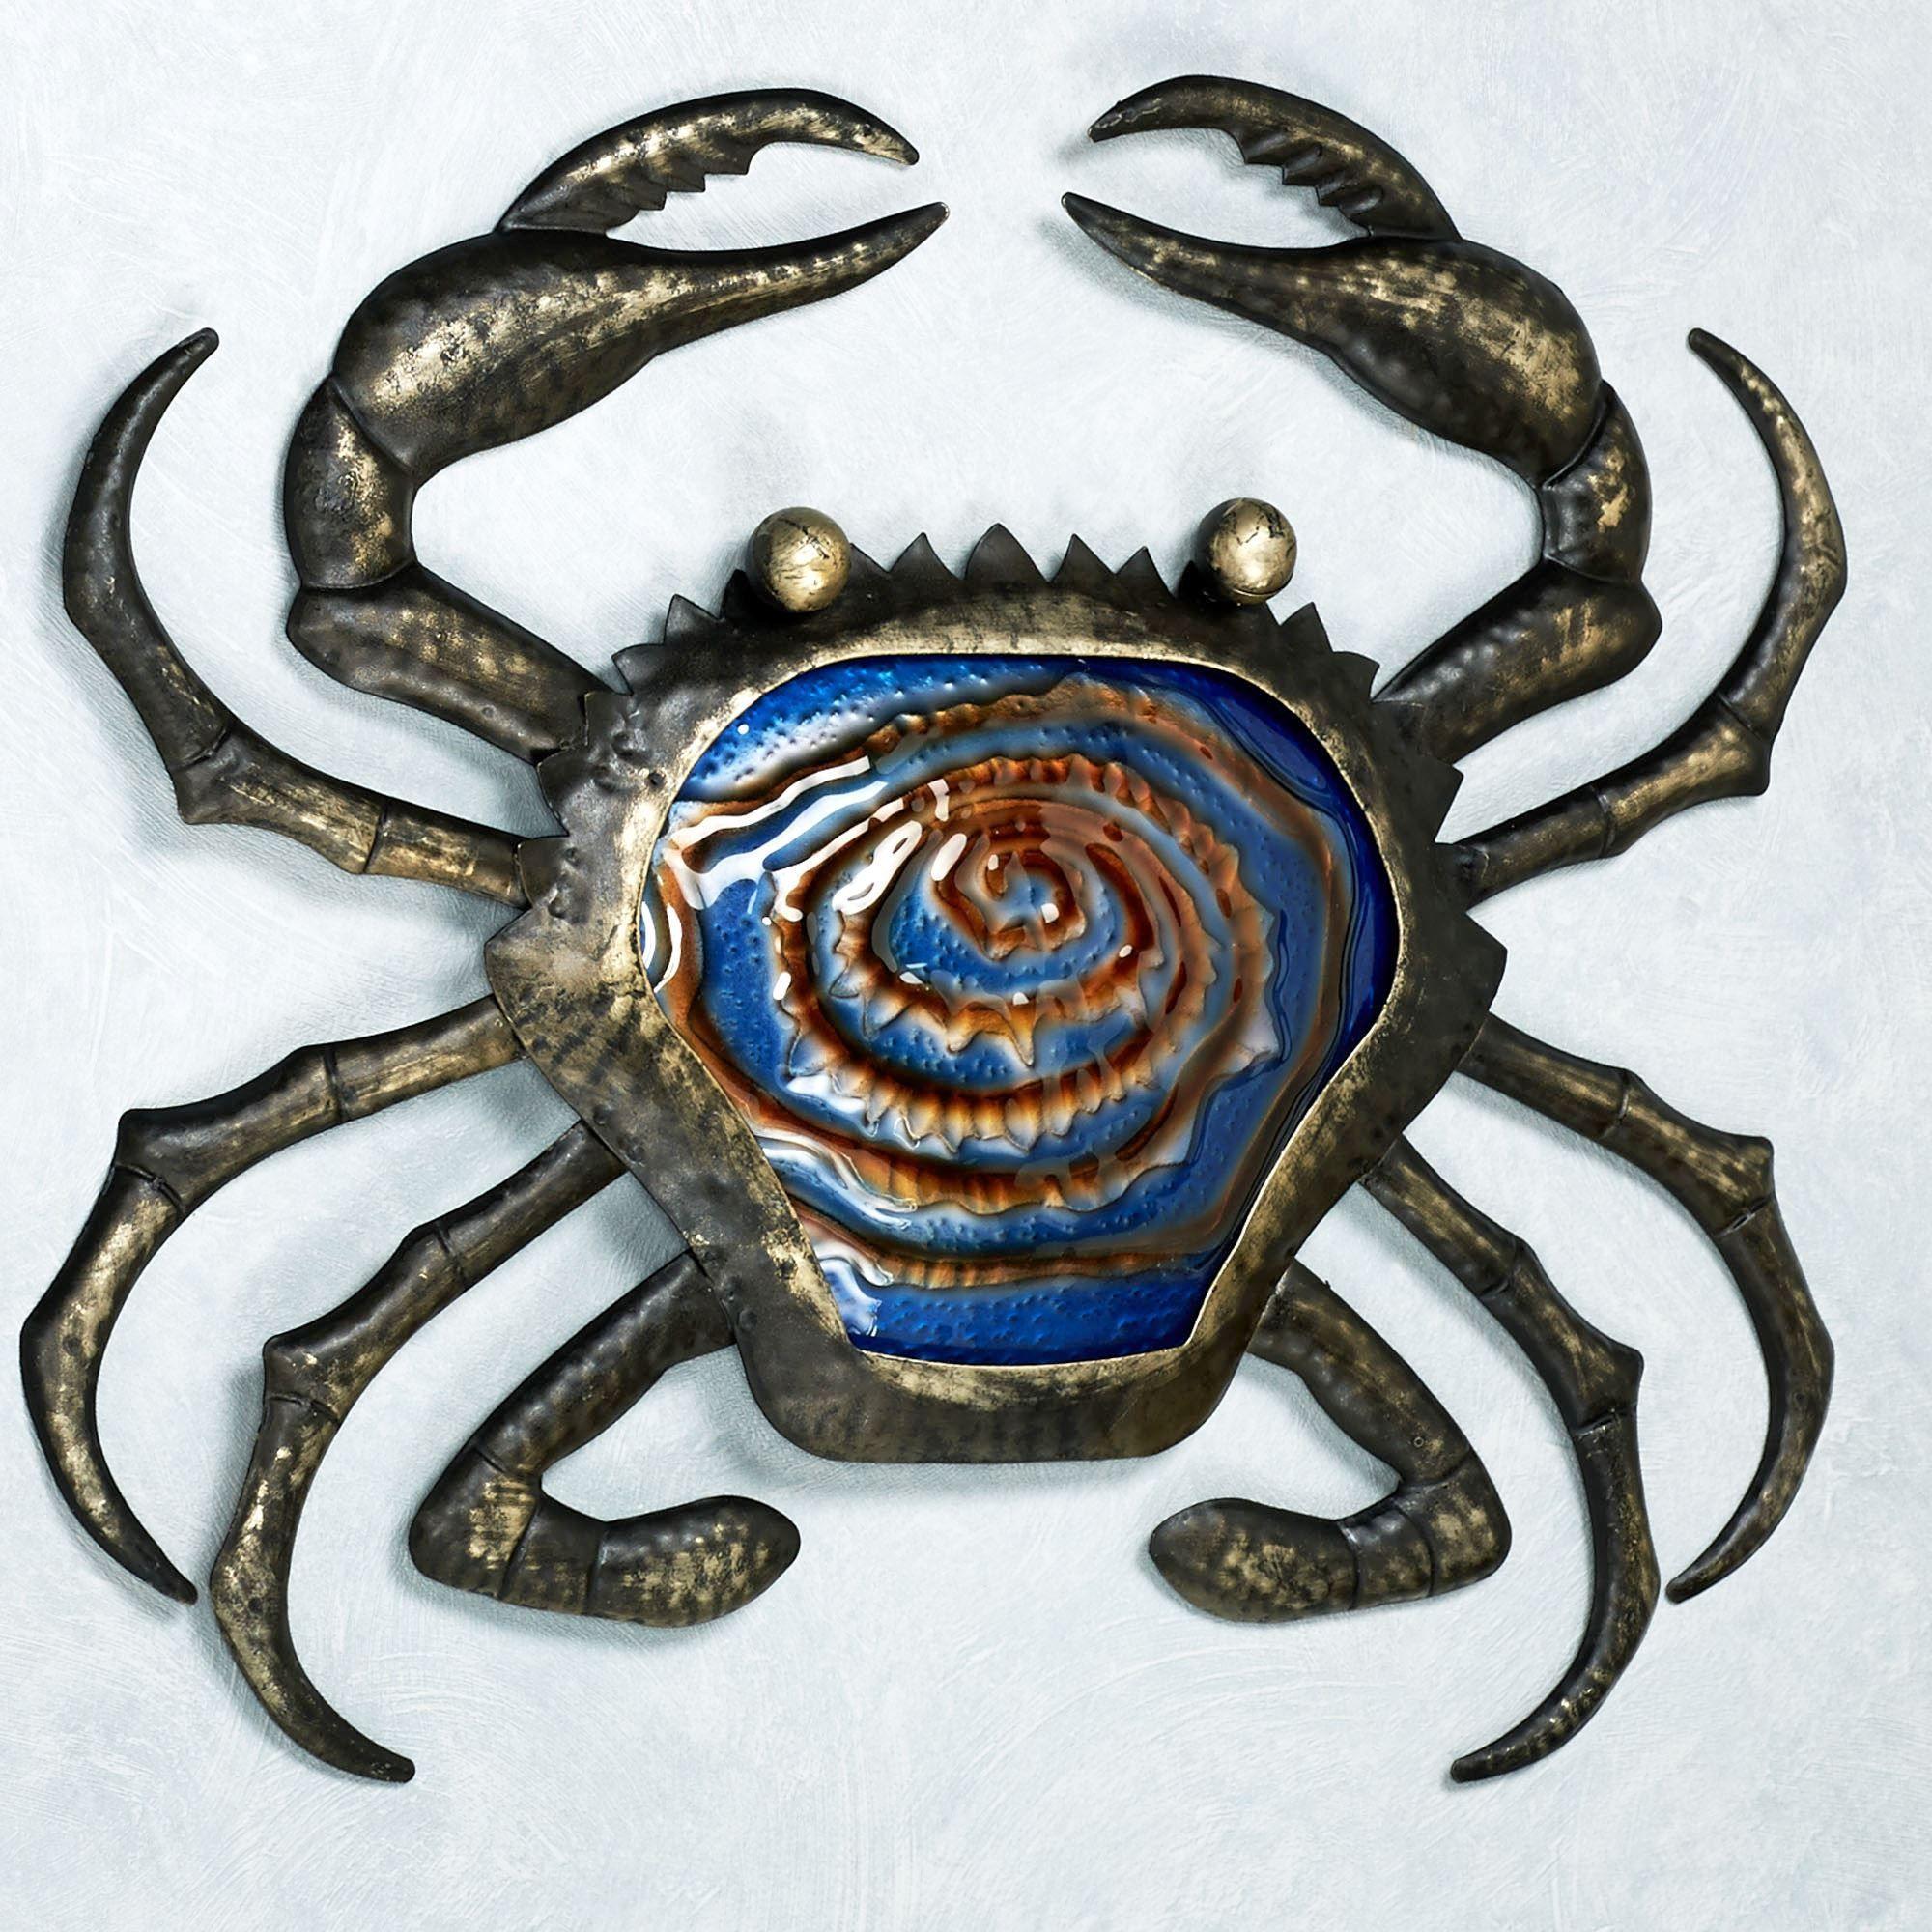 Sealife indoor outdoor glass metal wall art crab glass and metal wall art blackgold amipublicfo Gallery